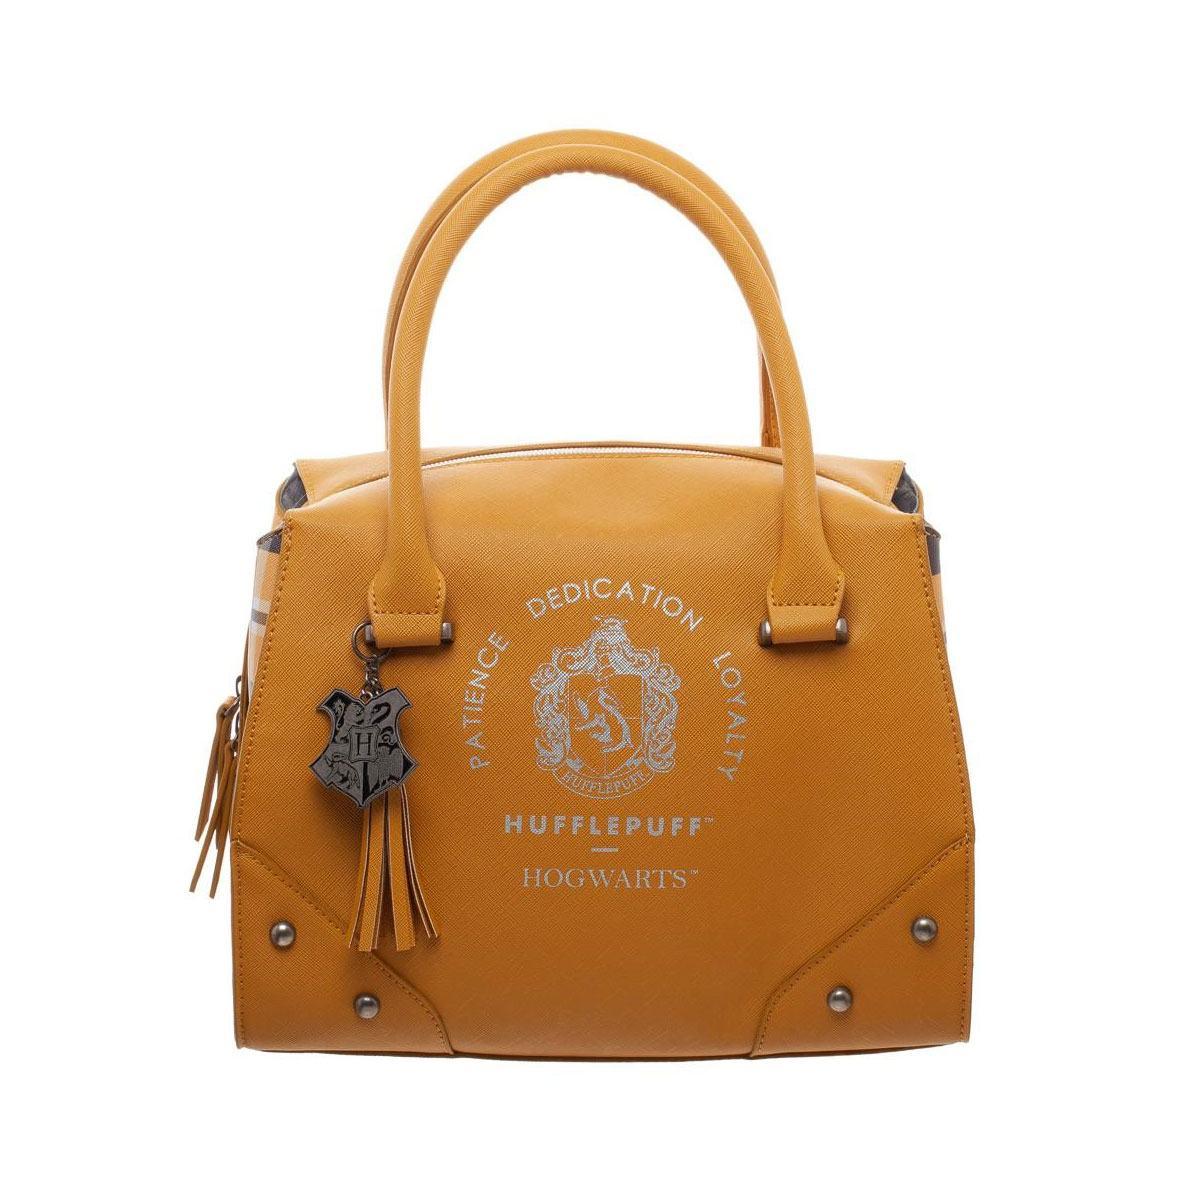 Harry Potter Handbag Hufflepuff Plaid Top